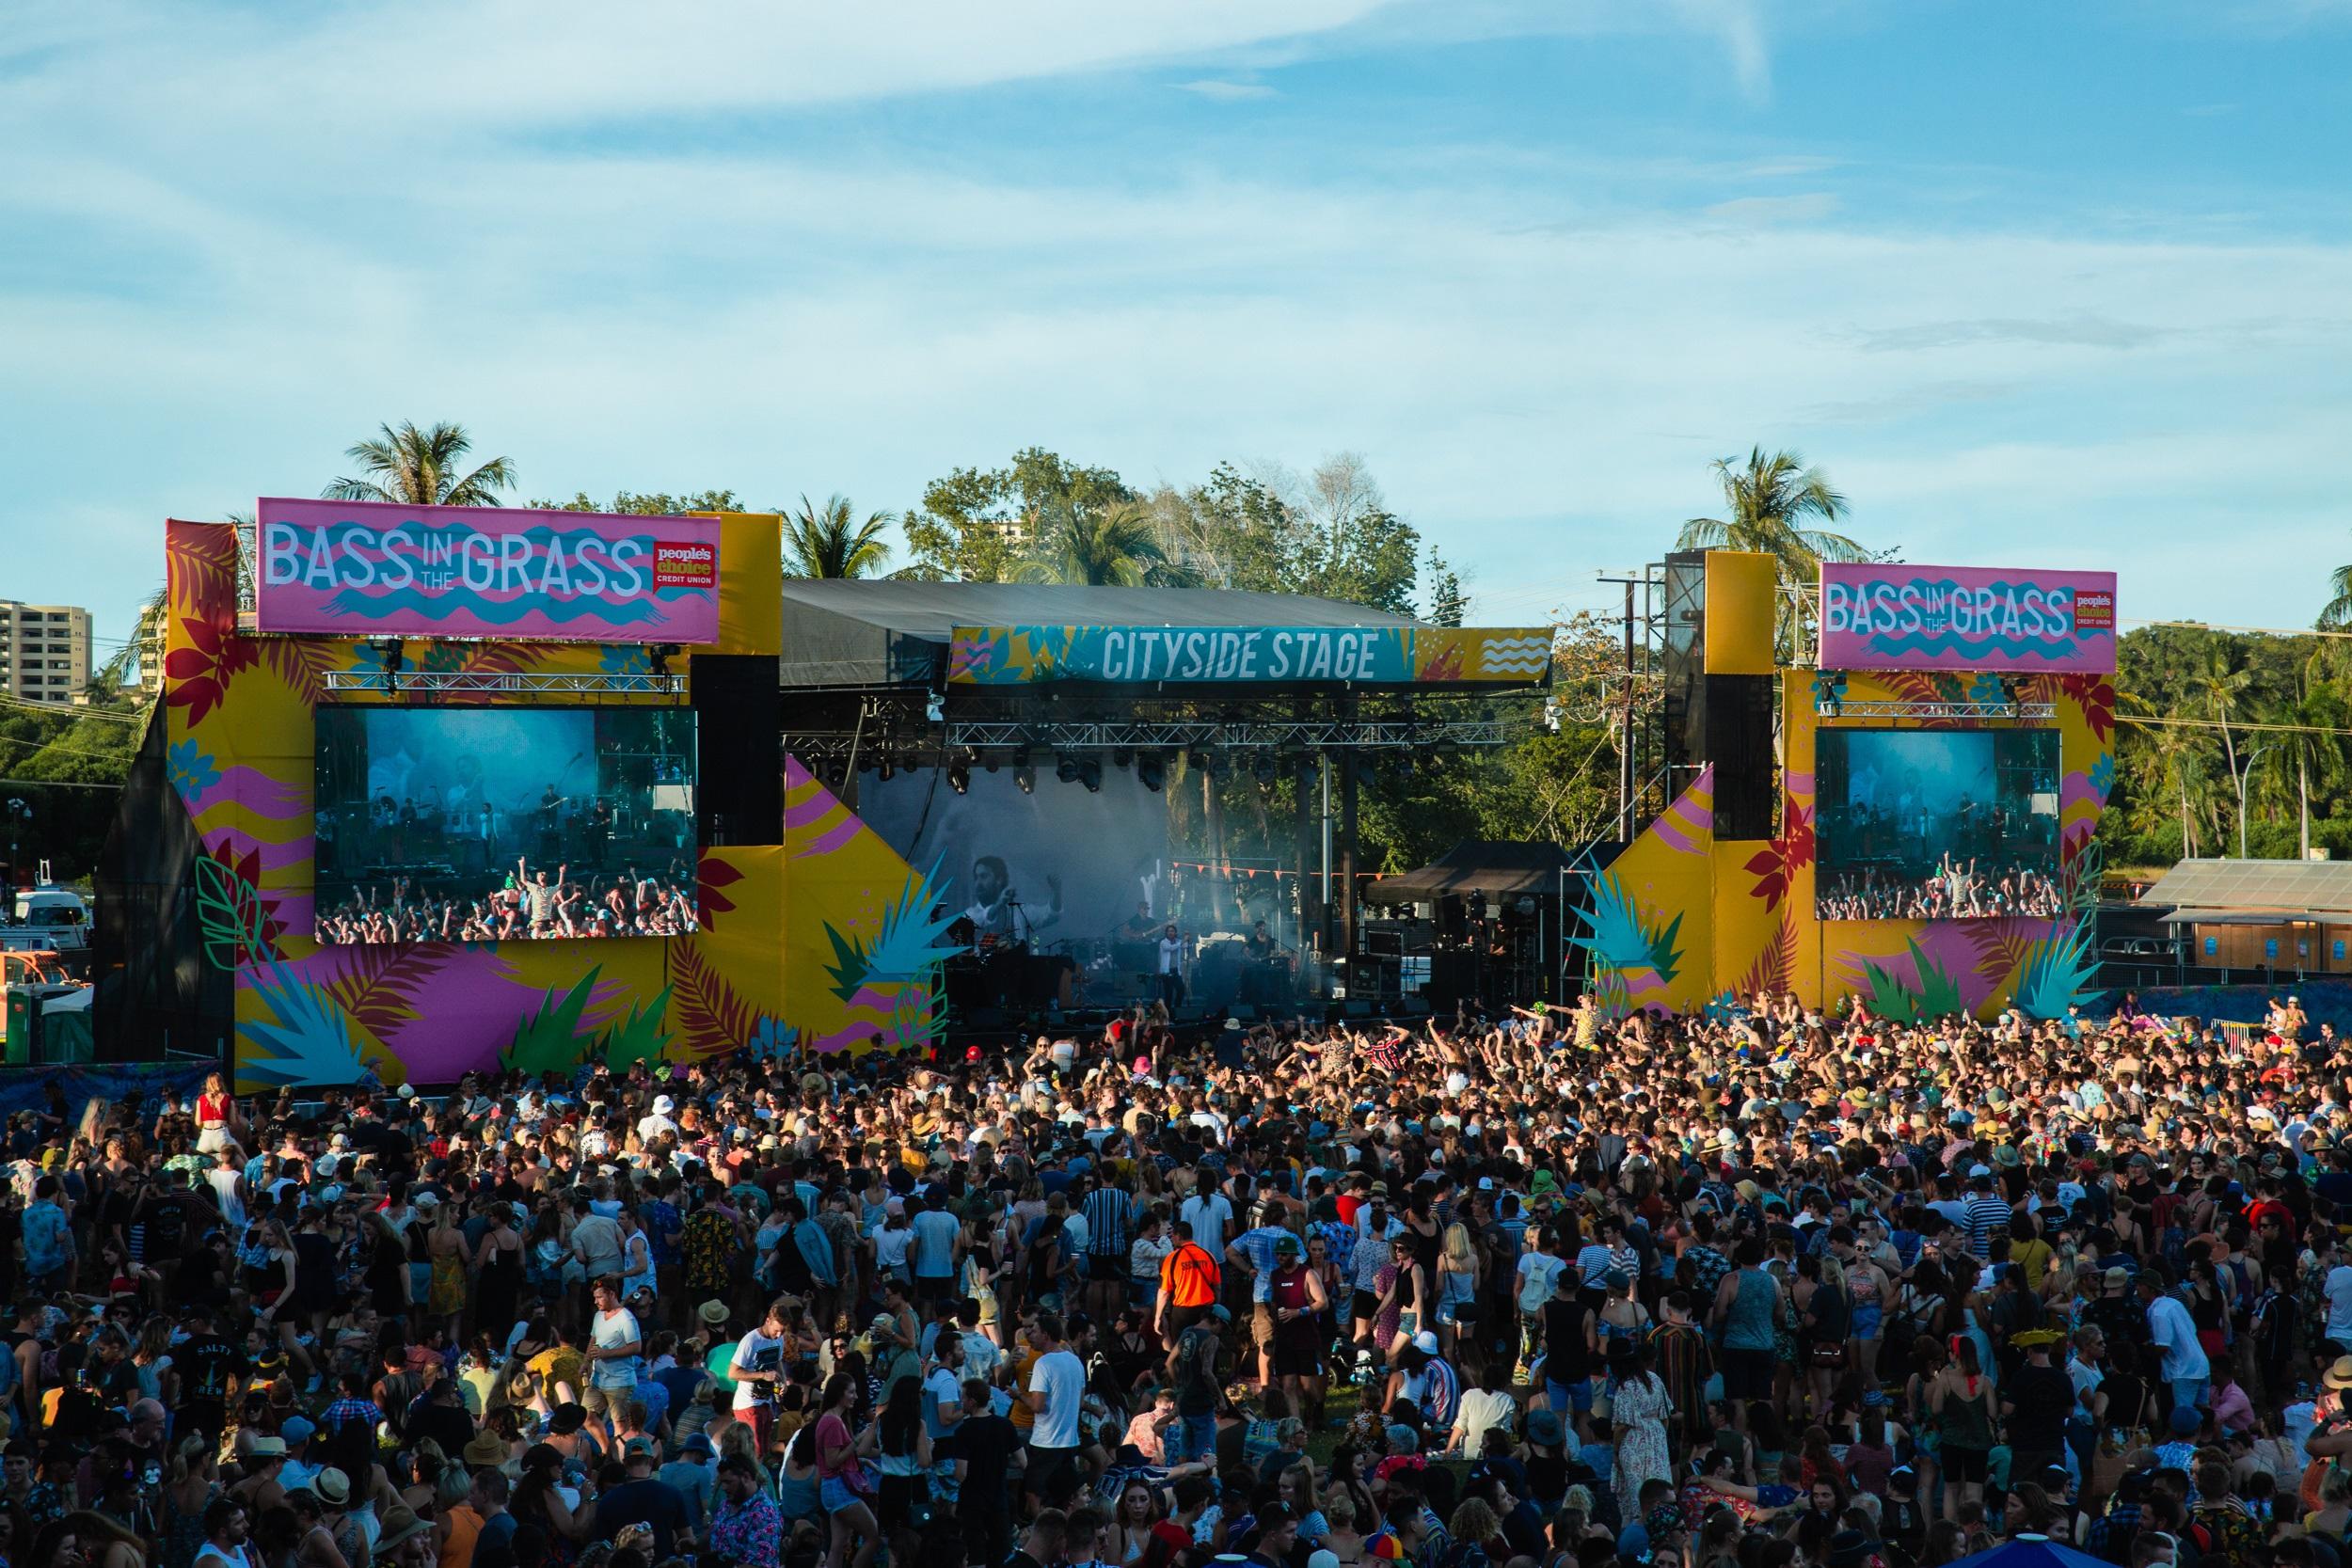 Violent Soho, Peking Duk, Thelma Plum & More To Play 2020 BASSINTHEGRASS Festival